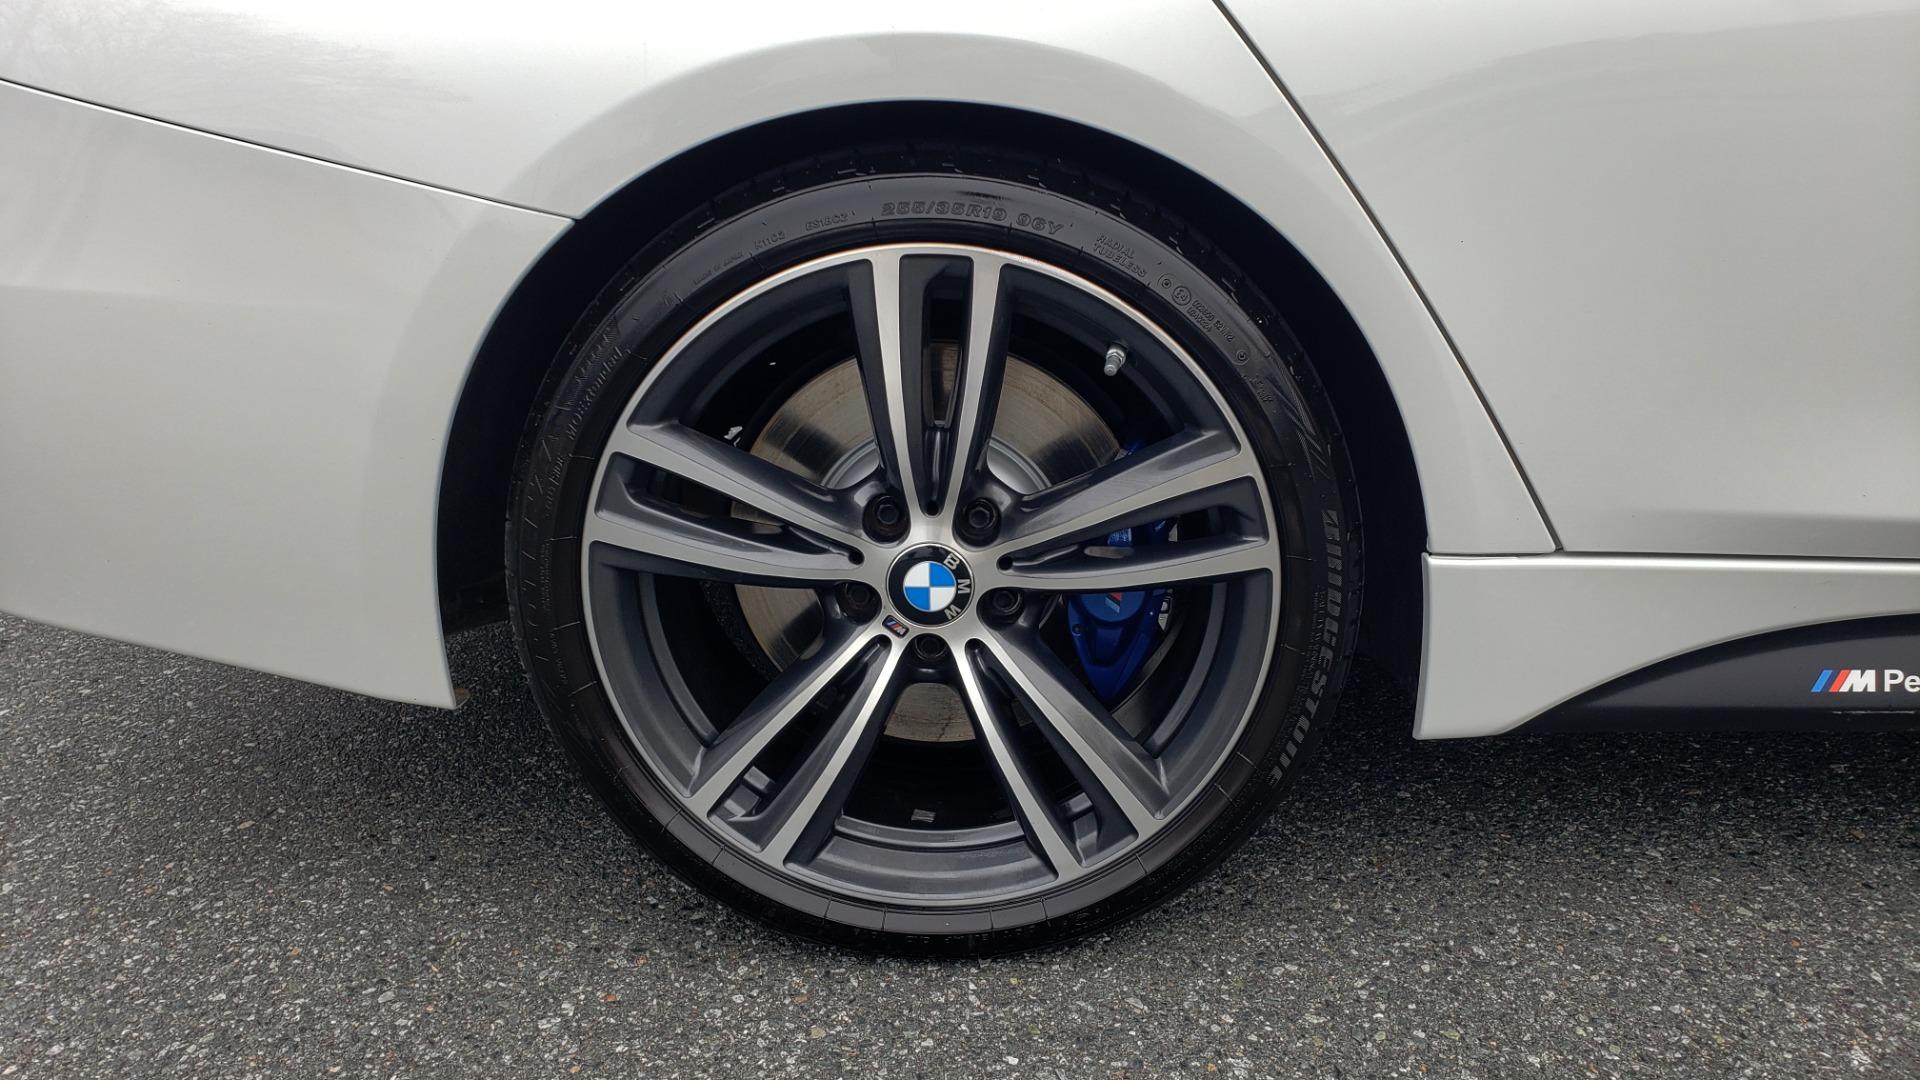 Used 2015 BMW 3 Series 335I M-SPORT / PREM PKG / HK SND / SUNROOF / REARVIEW for sale Sold at Formula Imports in Charlotte NC 28227 79